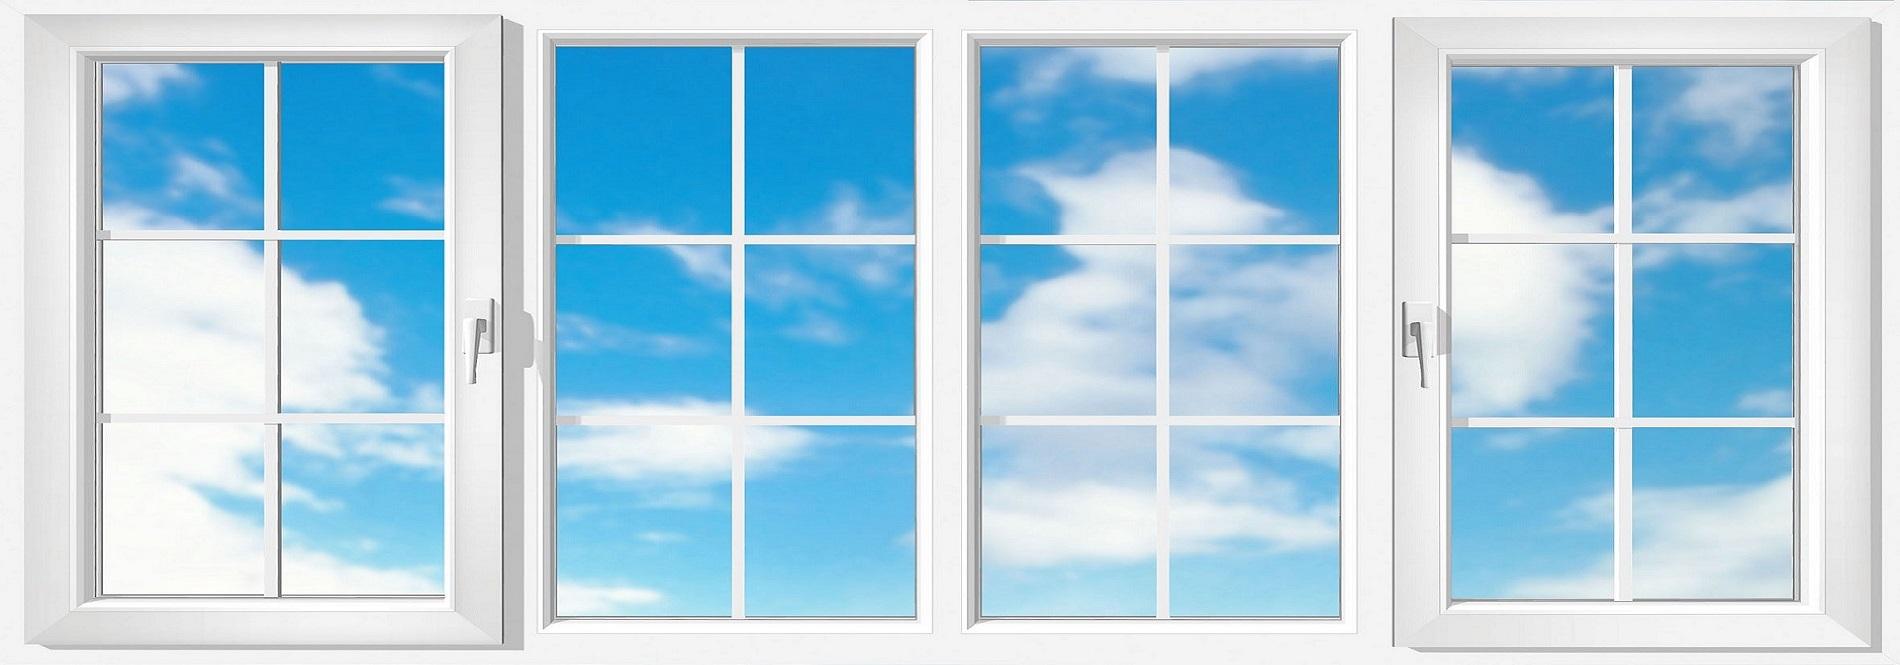 Pimapen Pencere Tamiri | Pimapen Pencere Servisi | Pimapen Pencere Montajı | PVC Pencere Sistemleri